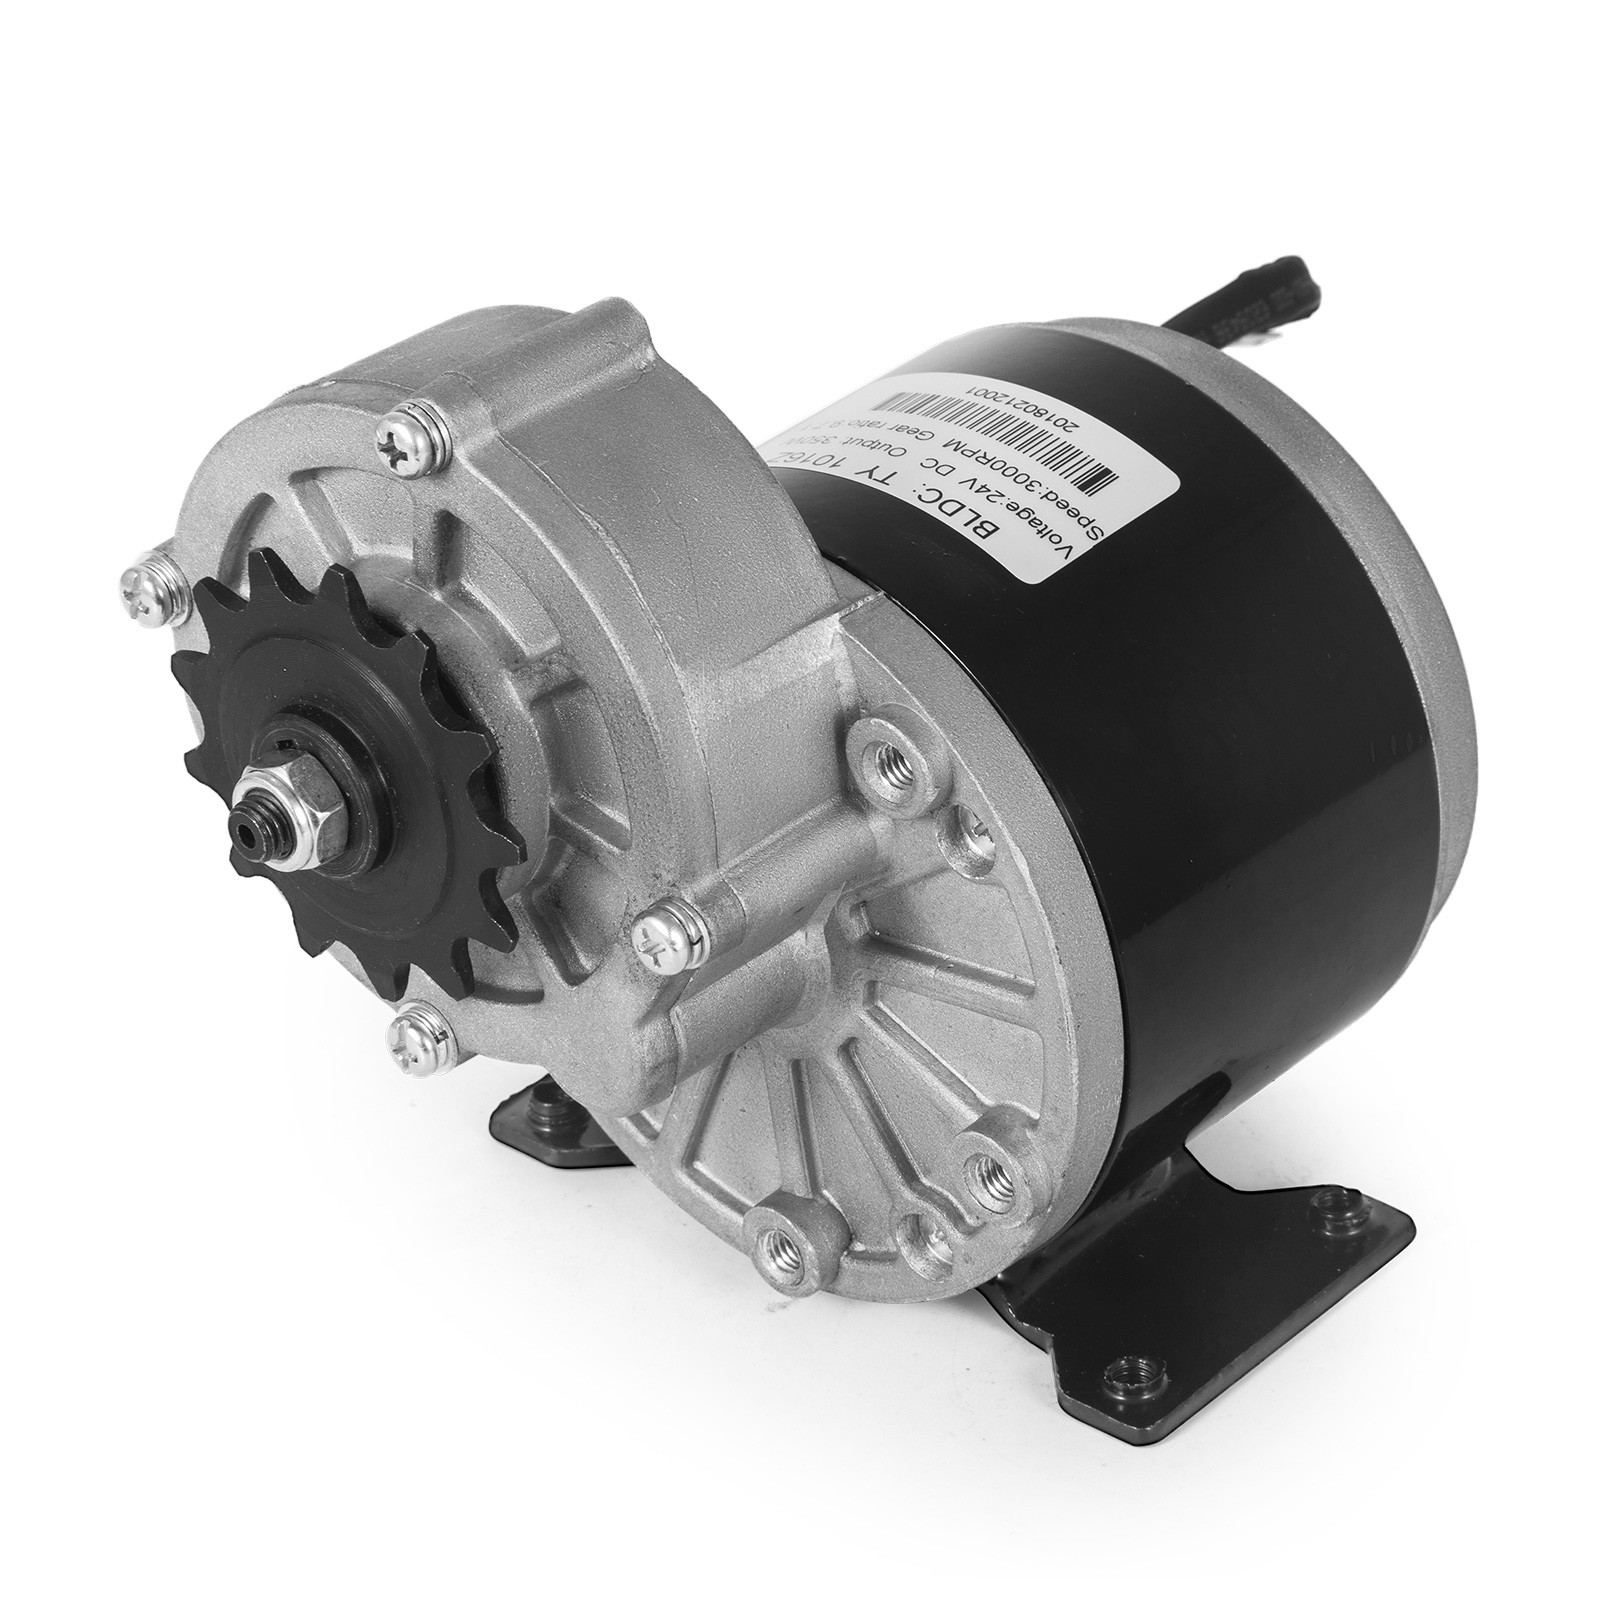 DC-electric-motor-12-60V-150W-2KW-for-scooter-bike-go-kart-minibike-e-ATV thumbnail 53